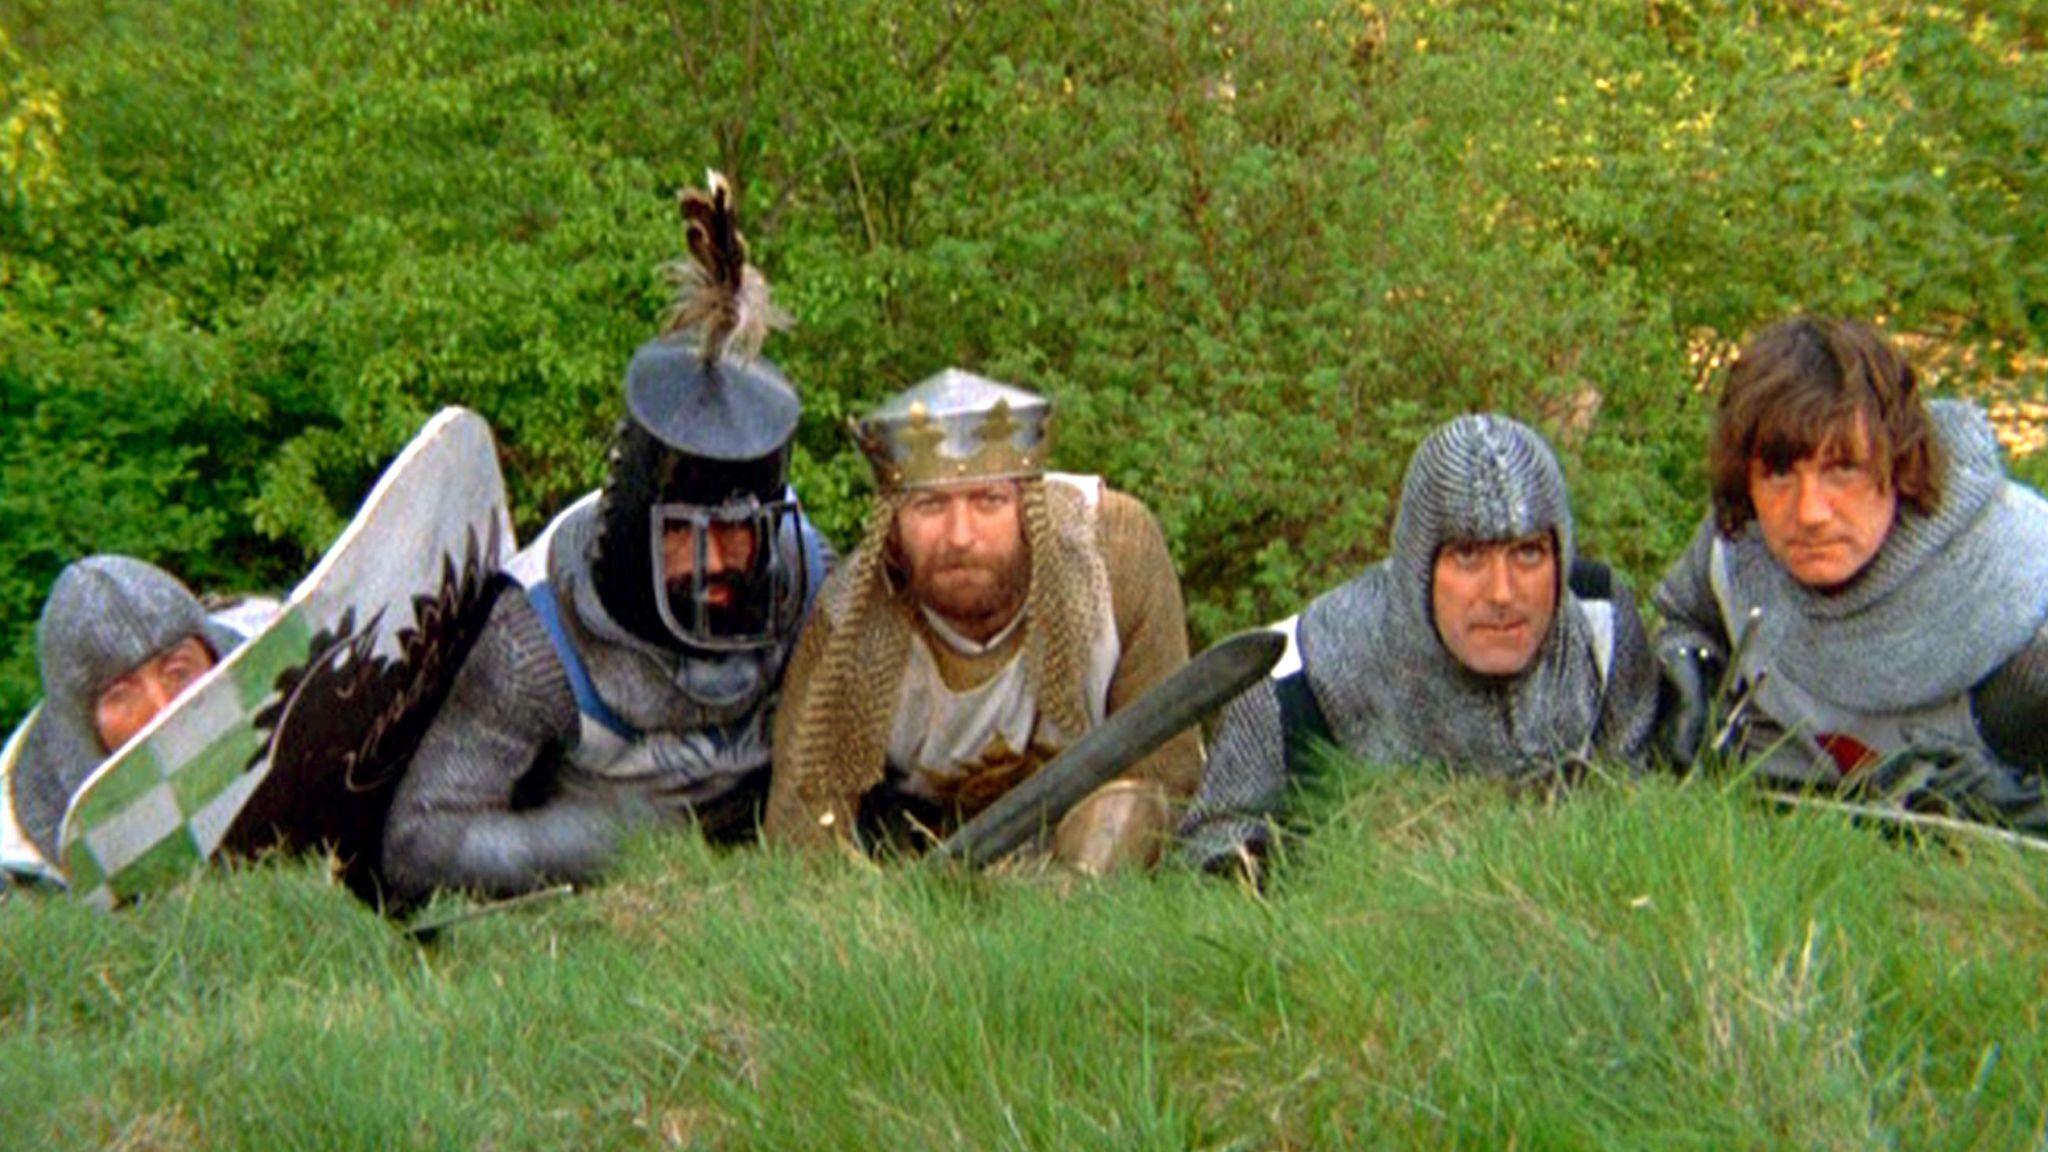 Monty Python & The Holy Grail - 1974 Eric Idle, Terry Jones, Graham Chapman, John Cleese, Michael Palin